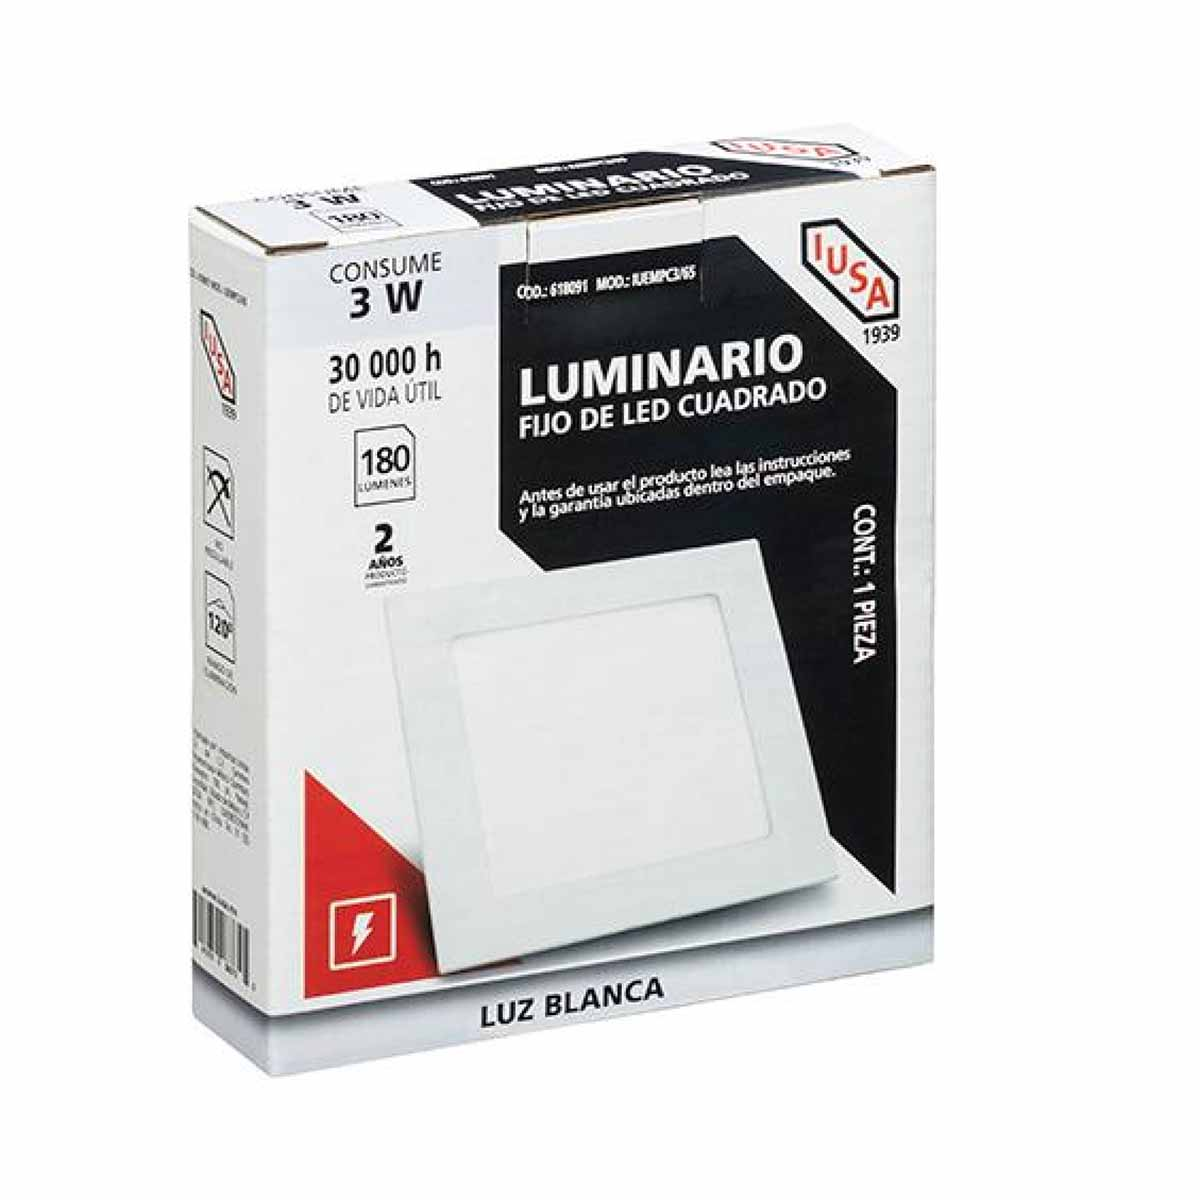 Foco Luminario Led Cuadrado Fijo Luz Blanca 3 W 618091 Iusa